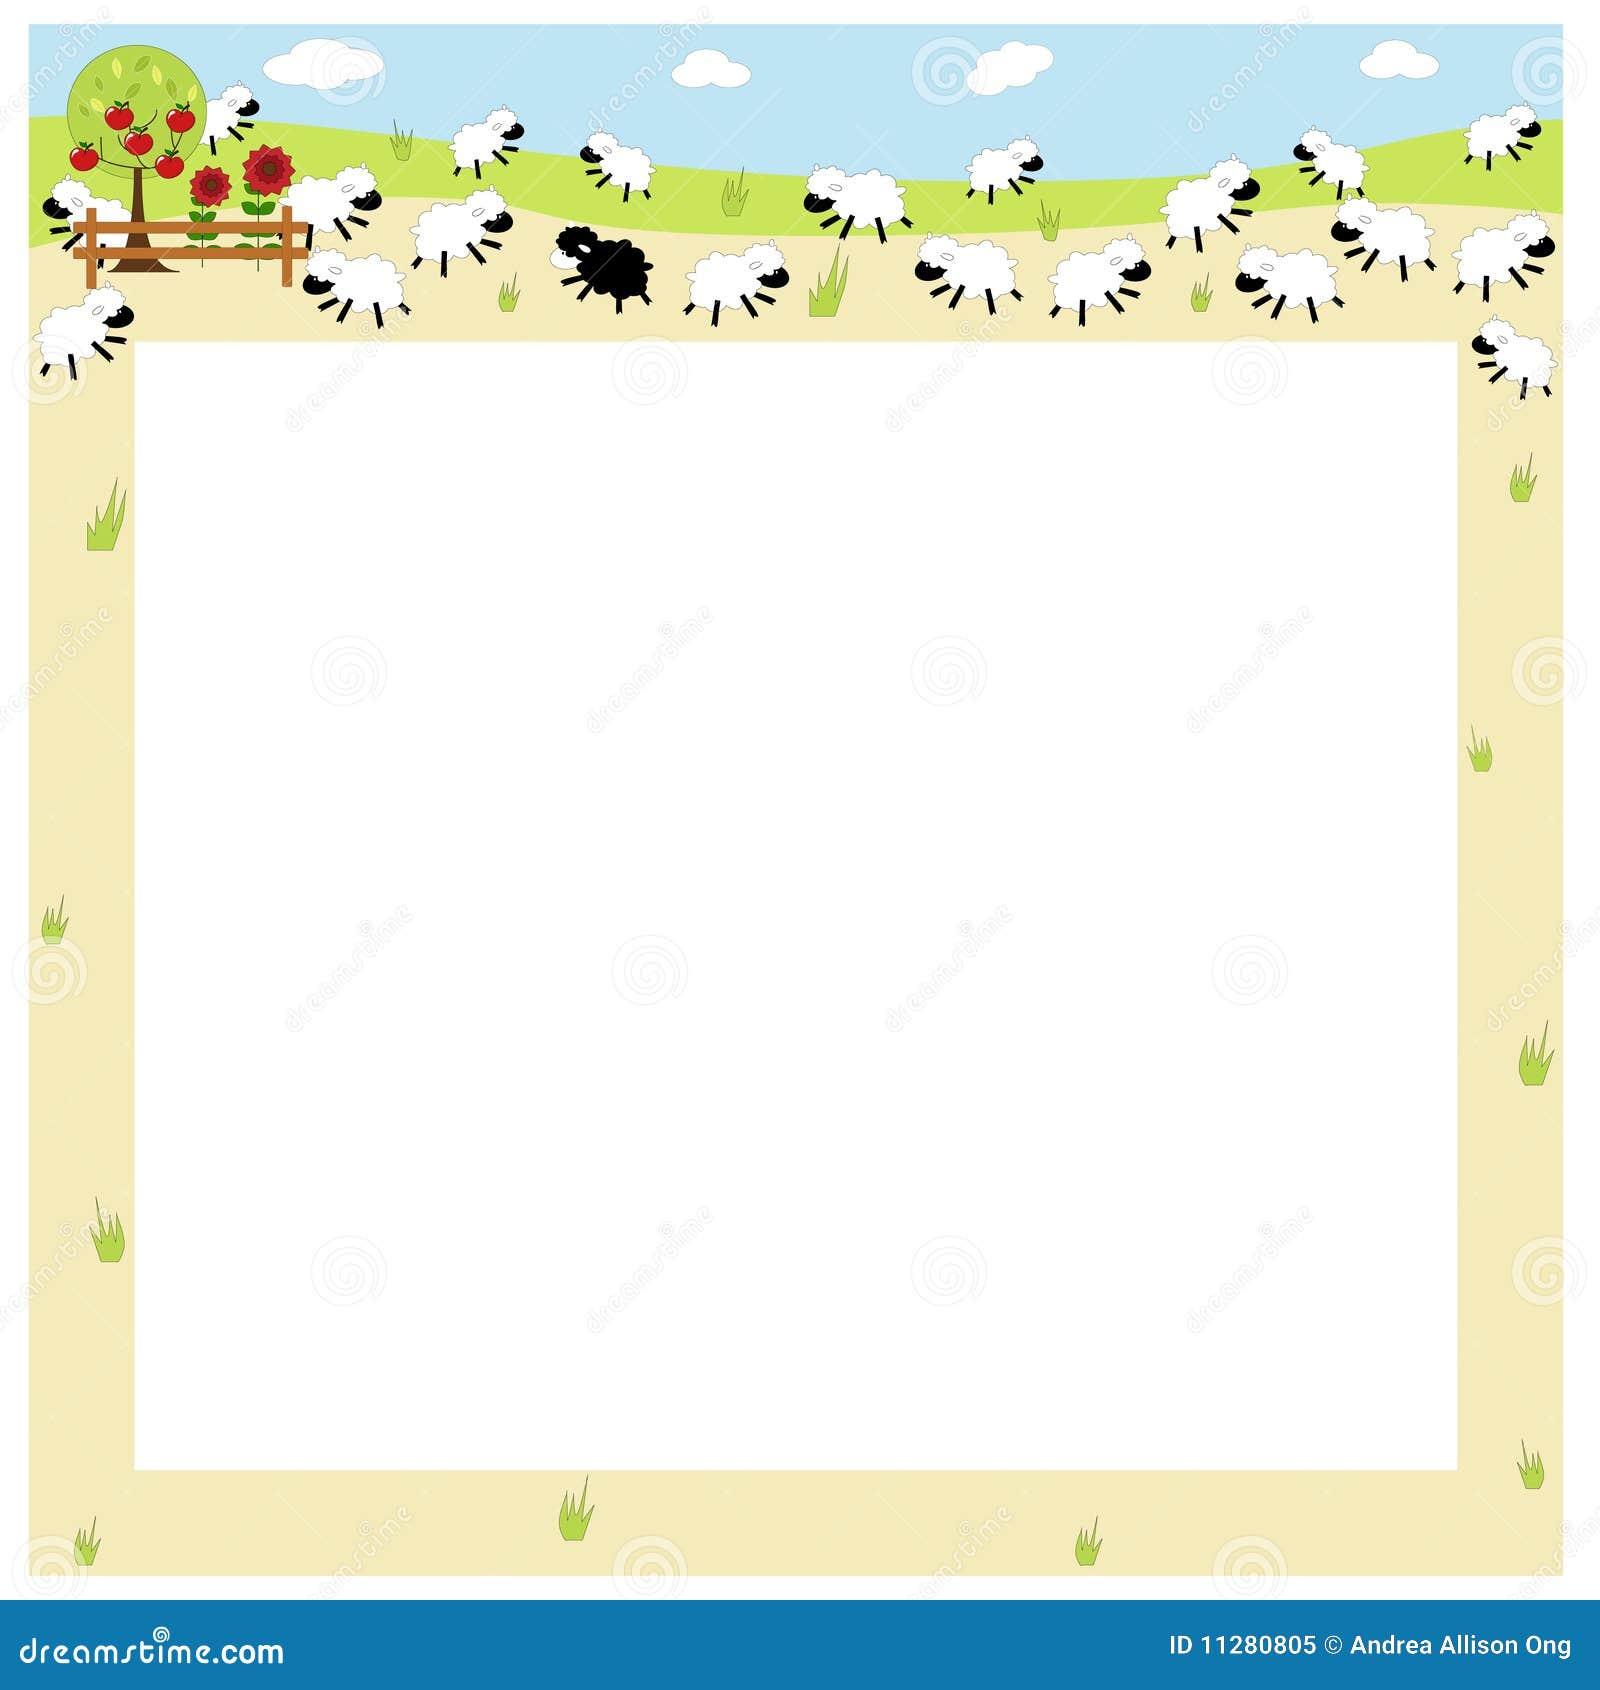 sheep border royalty free stock photo image 11280805 basketball border clip art free baseball border clip art